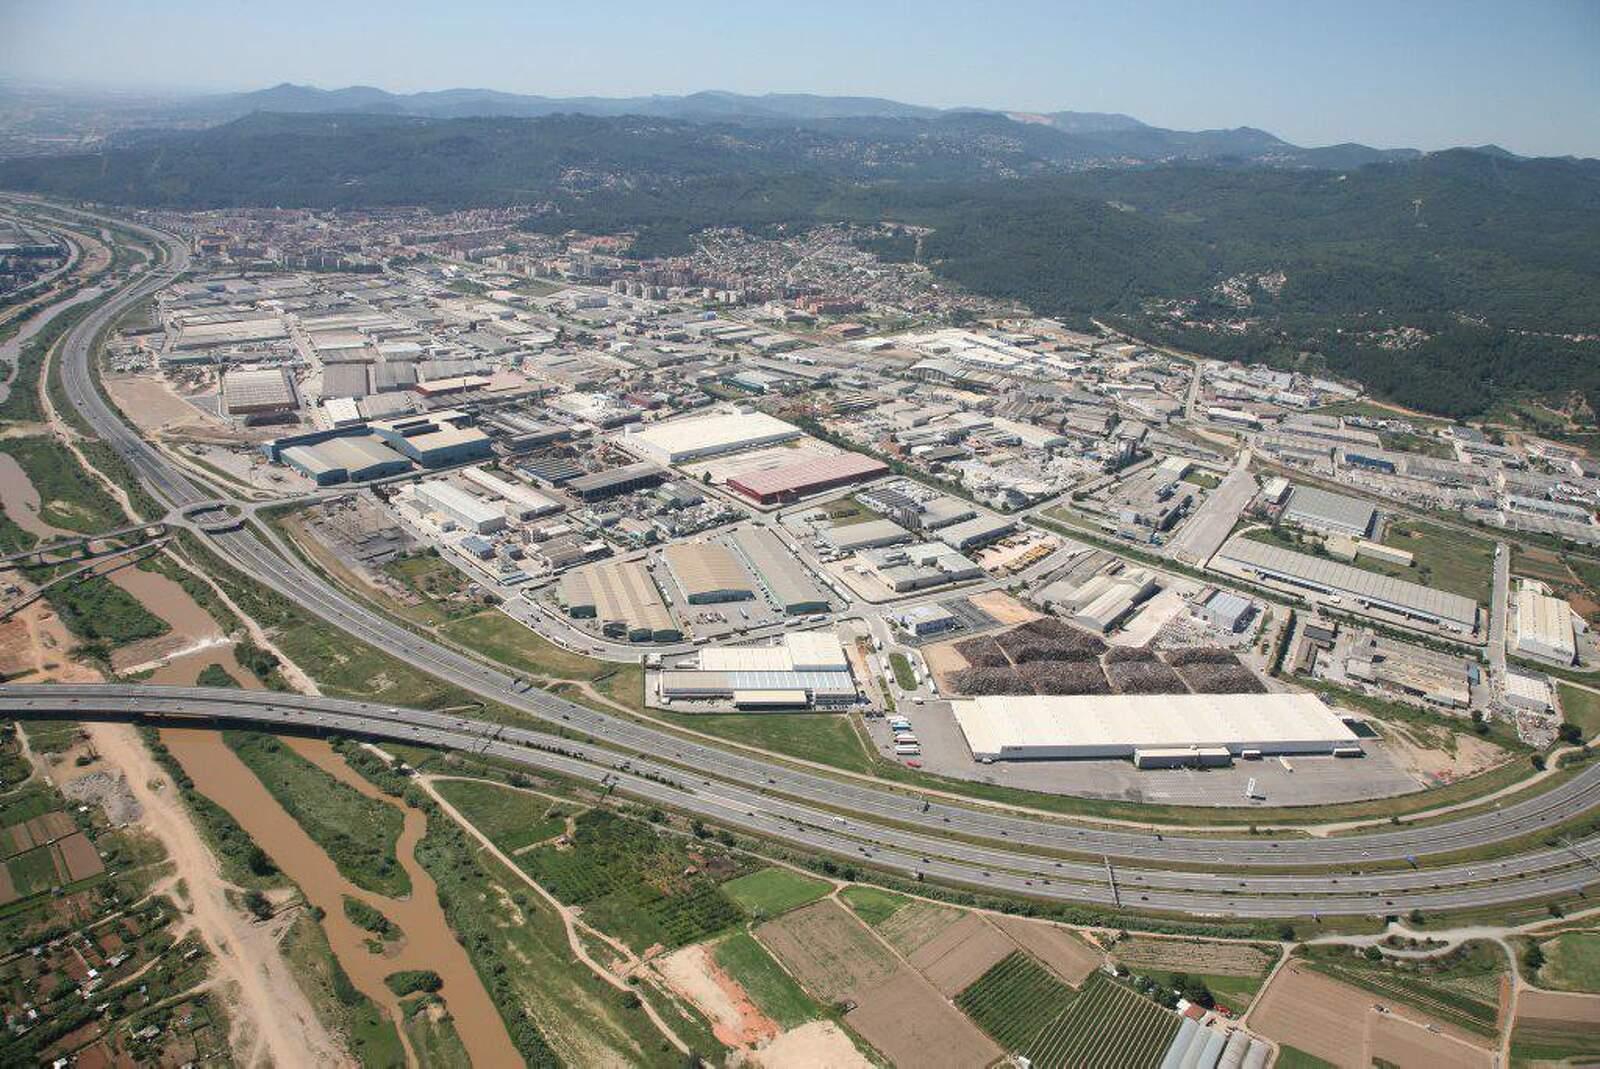 Polígon industrial de Castellbisbal